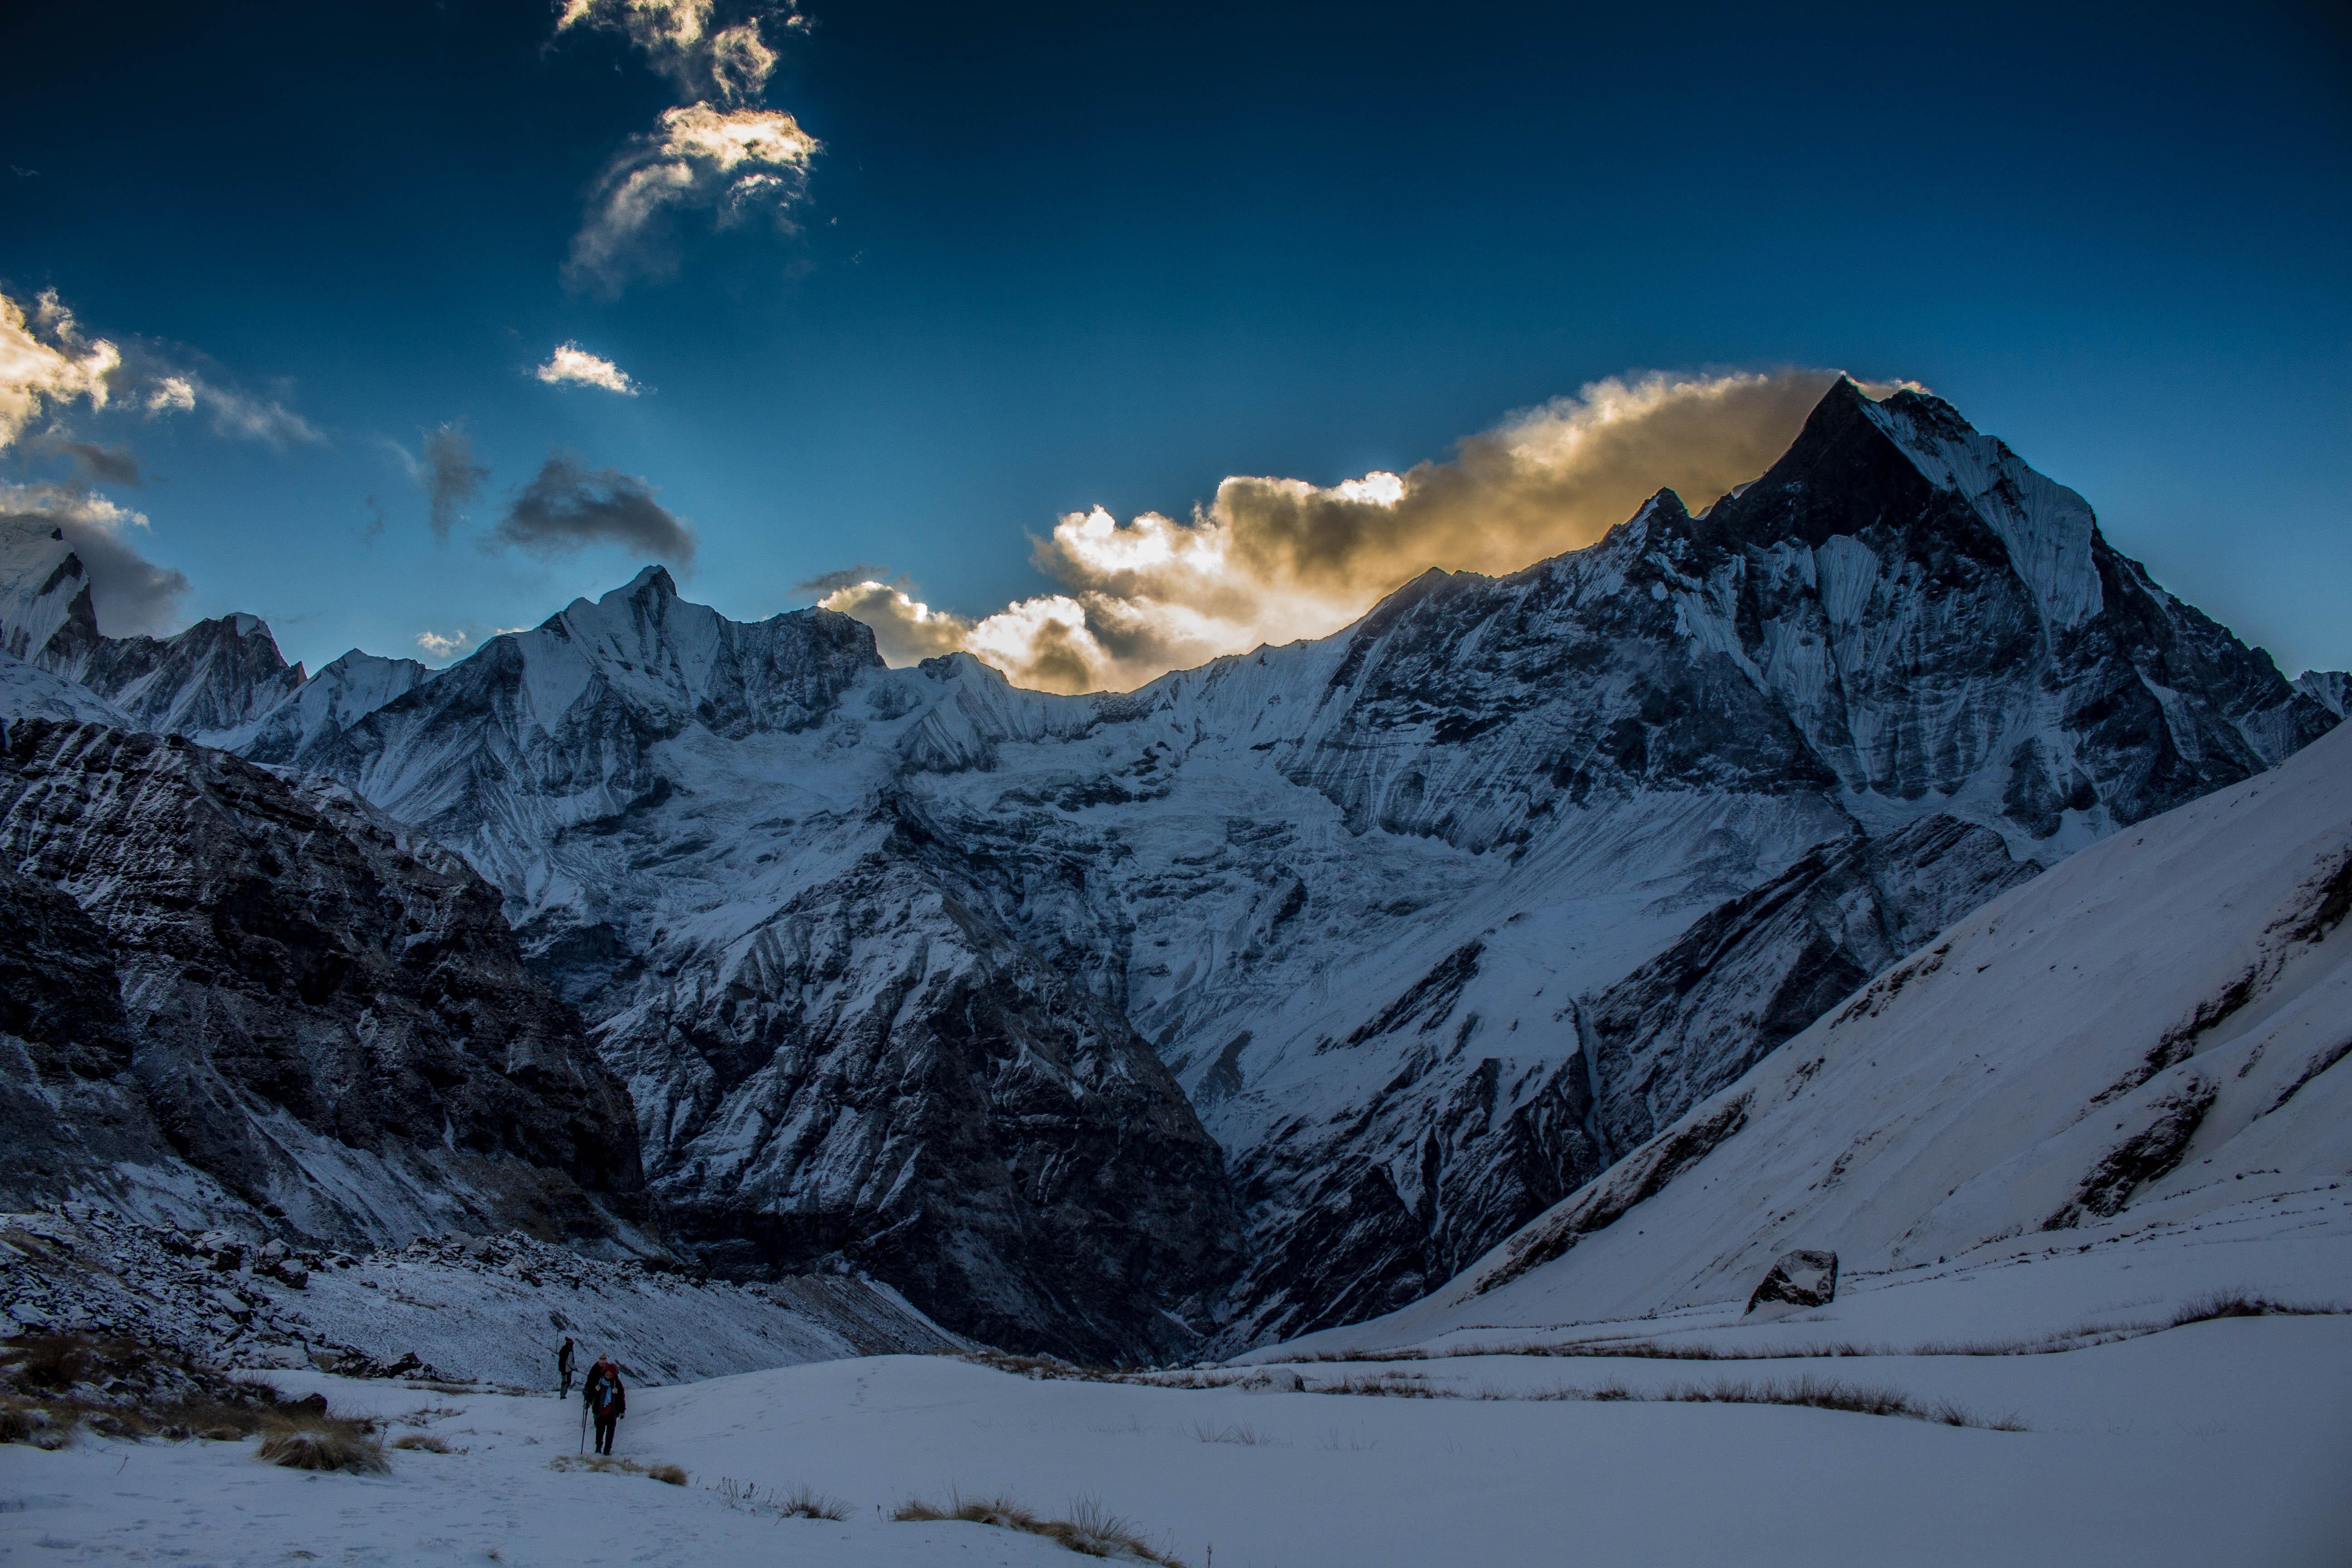 Person walking in snow mountain photo